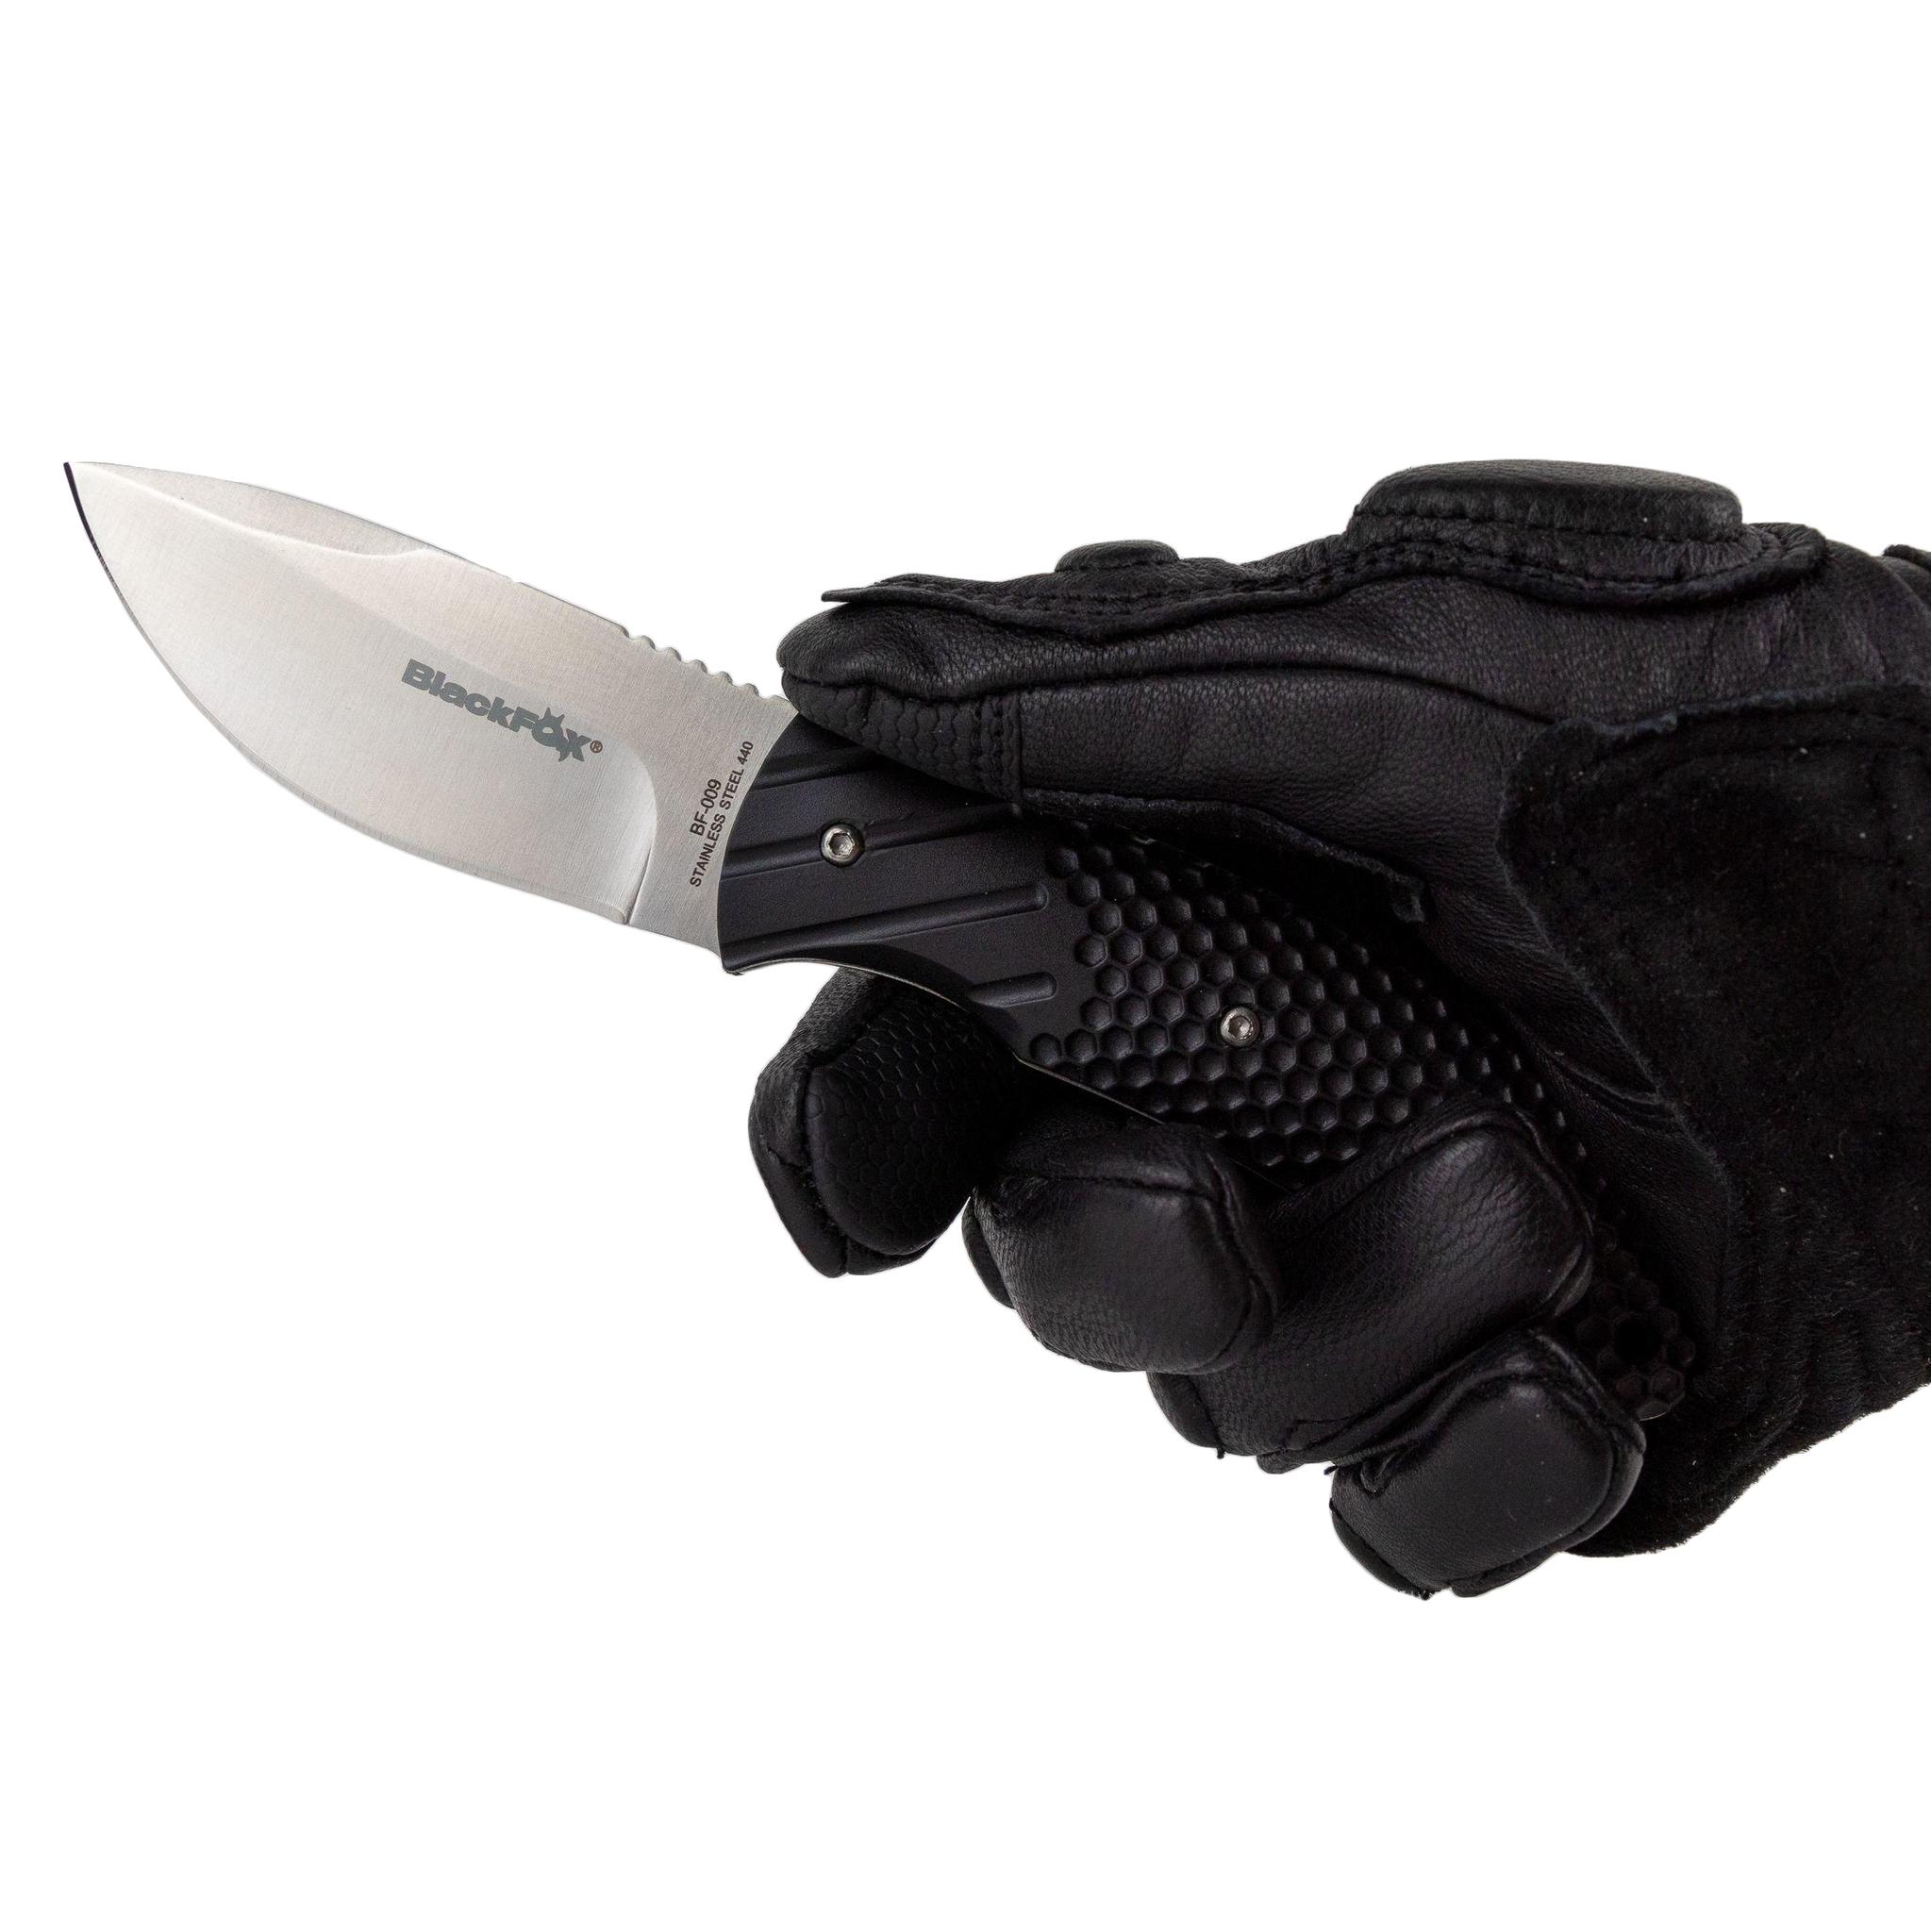 Фото 7 - Нож Fox, сталь 440А, рукоять термопластик FRN, чёрный